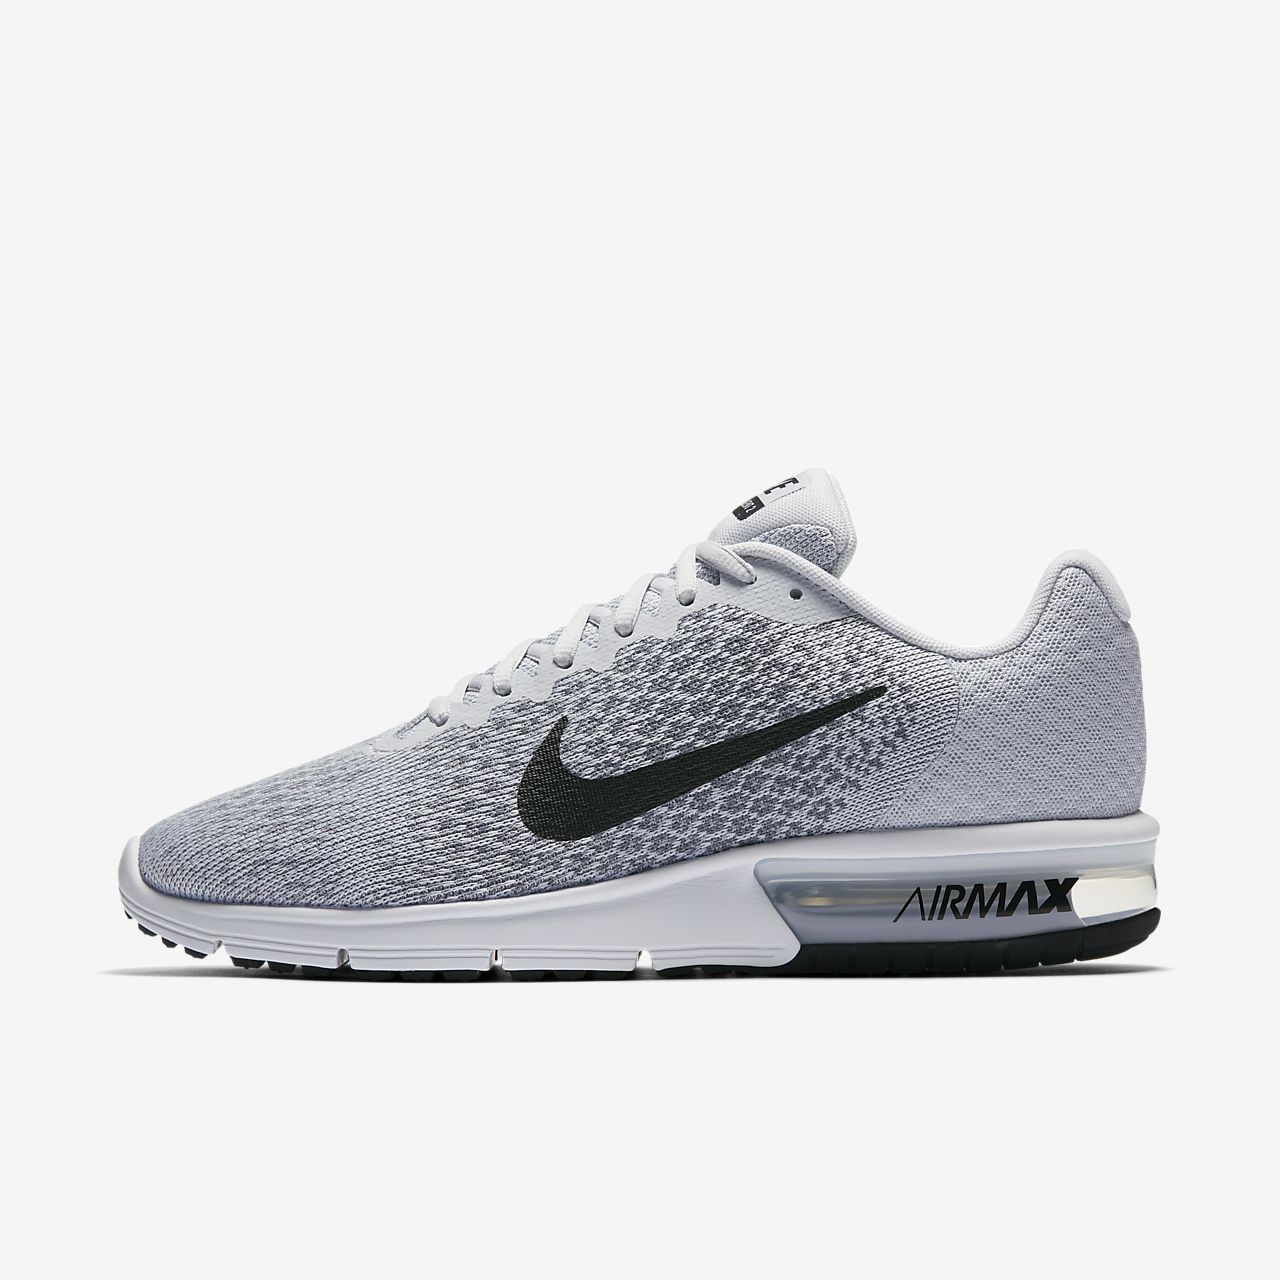 29eb9de631b0 ... ireland nike air max sequent 2 mens running shoe 485f6 3d78c